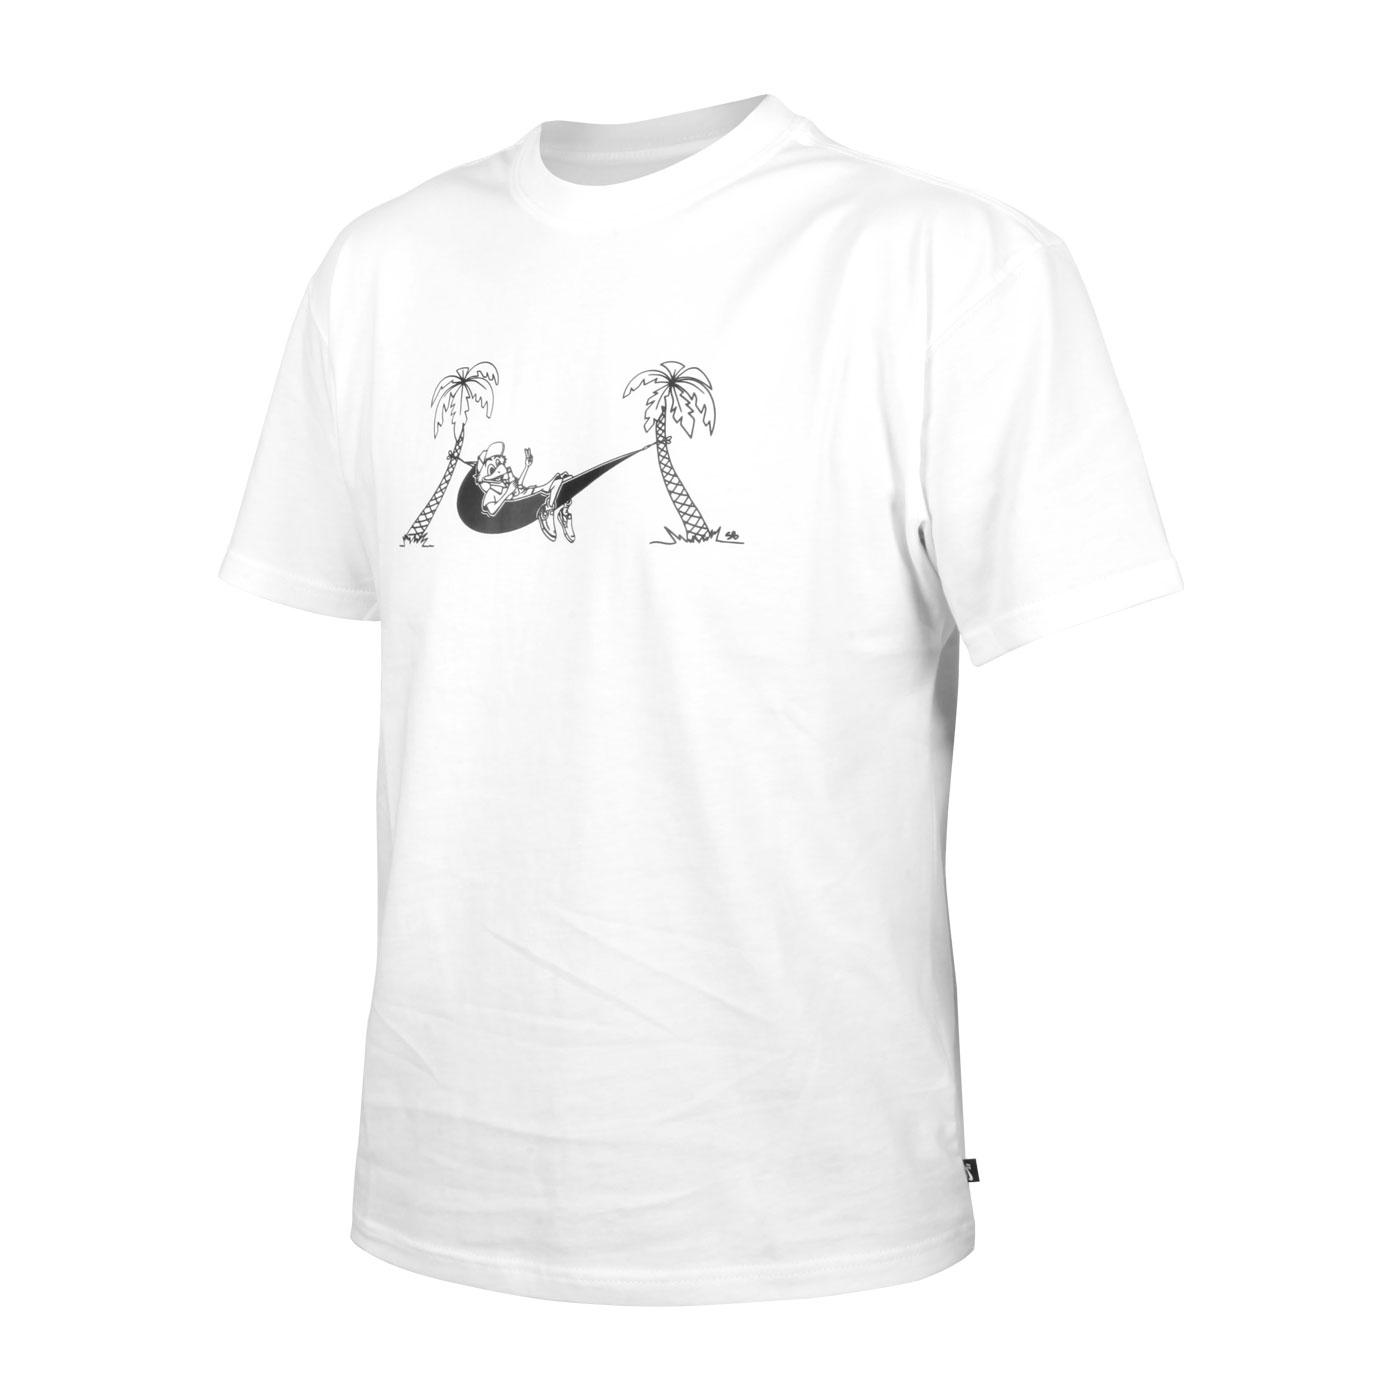 NIKE 男款短袖T恤 CZ6174-100 - 白黑